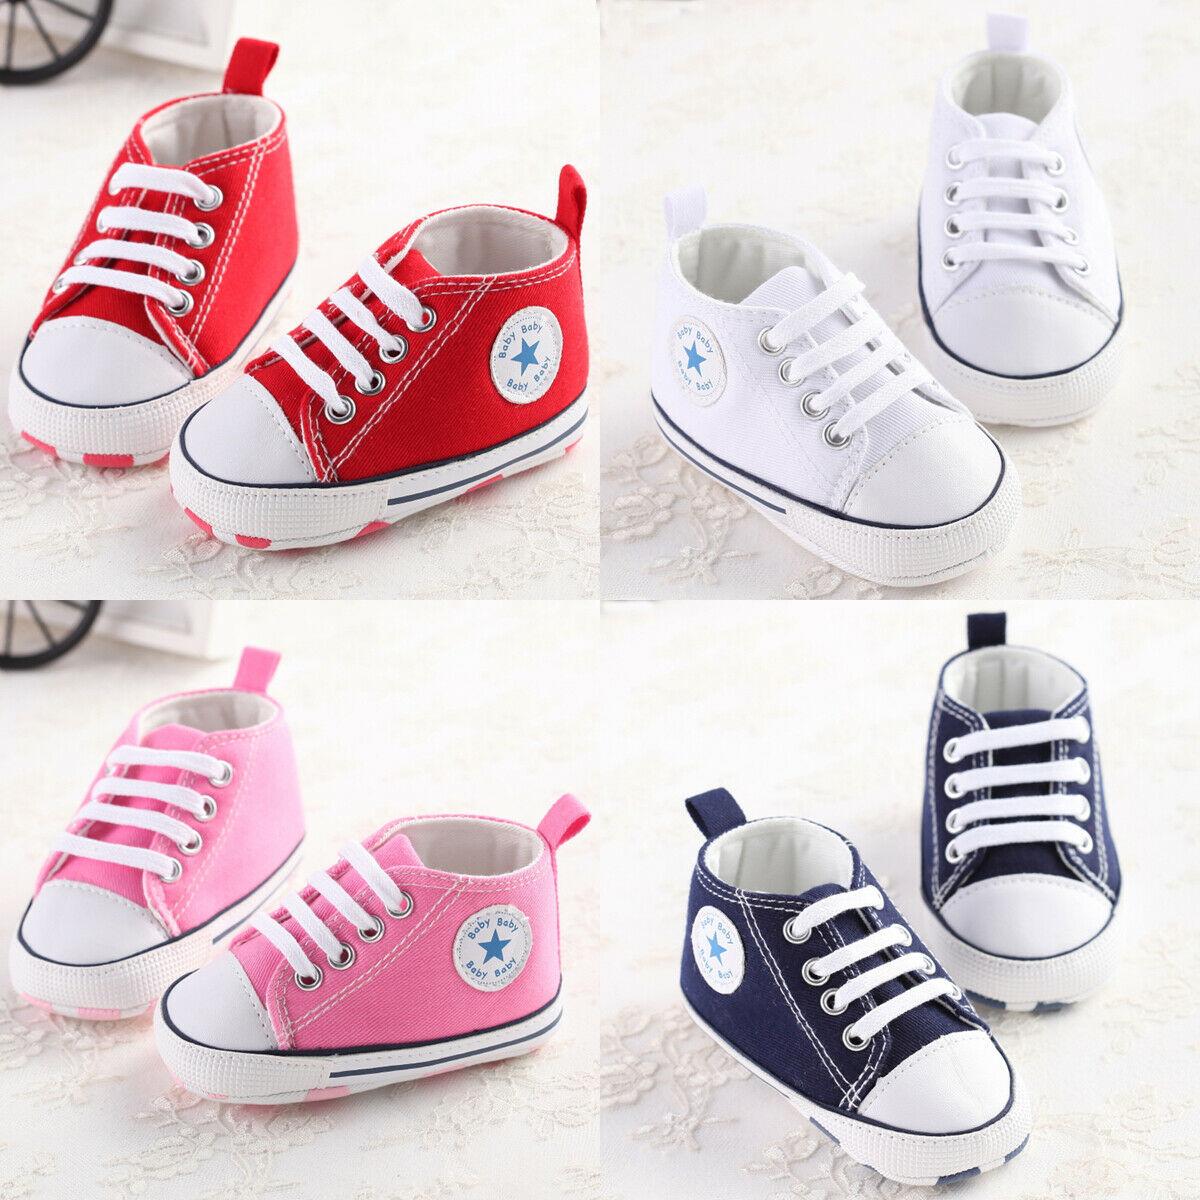 Toddler Baby Shoes Newborn Boys Girls Soft Soled Girl Crib Shoes Prewalker Sneakers